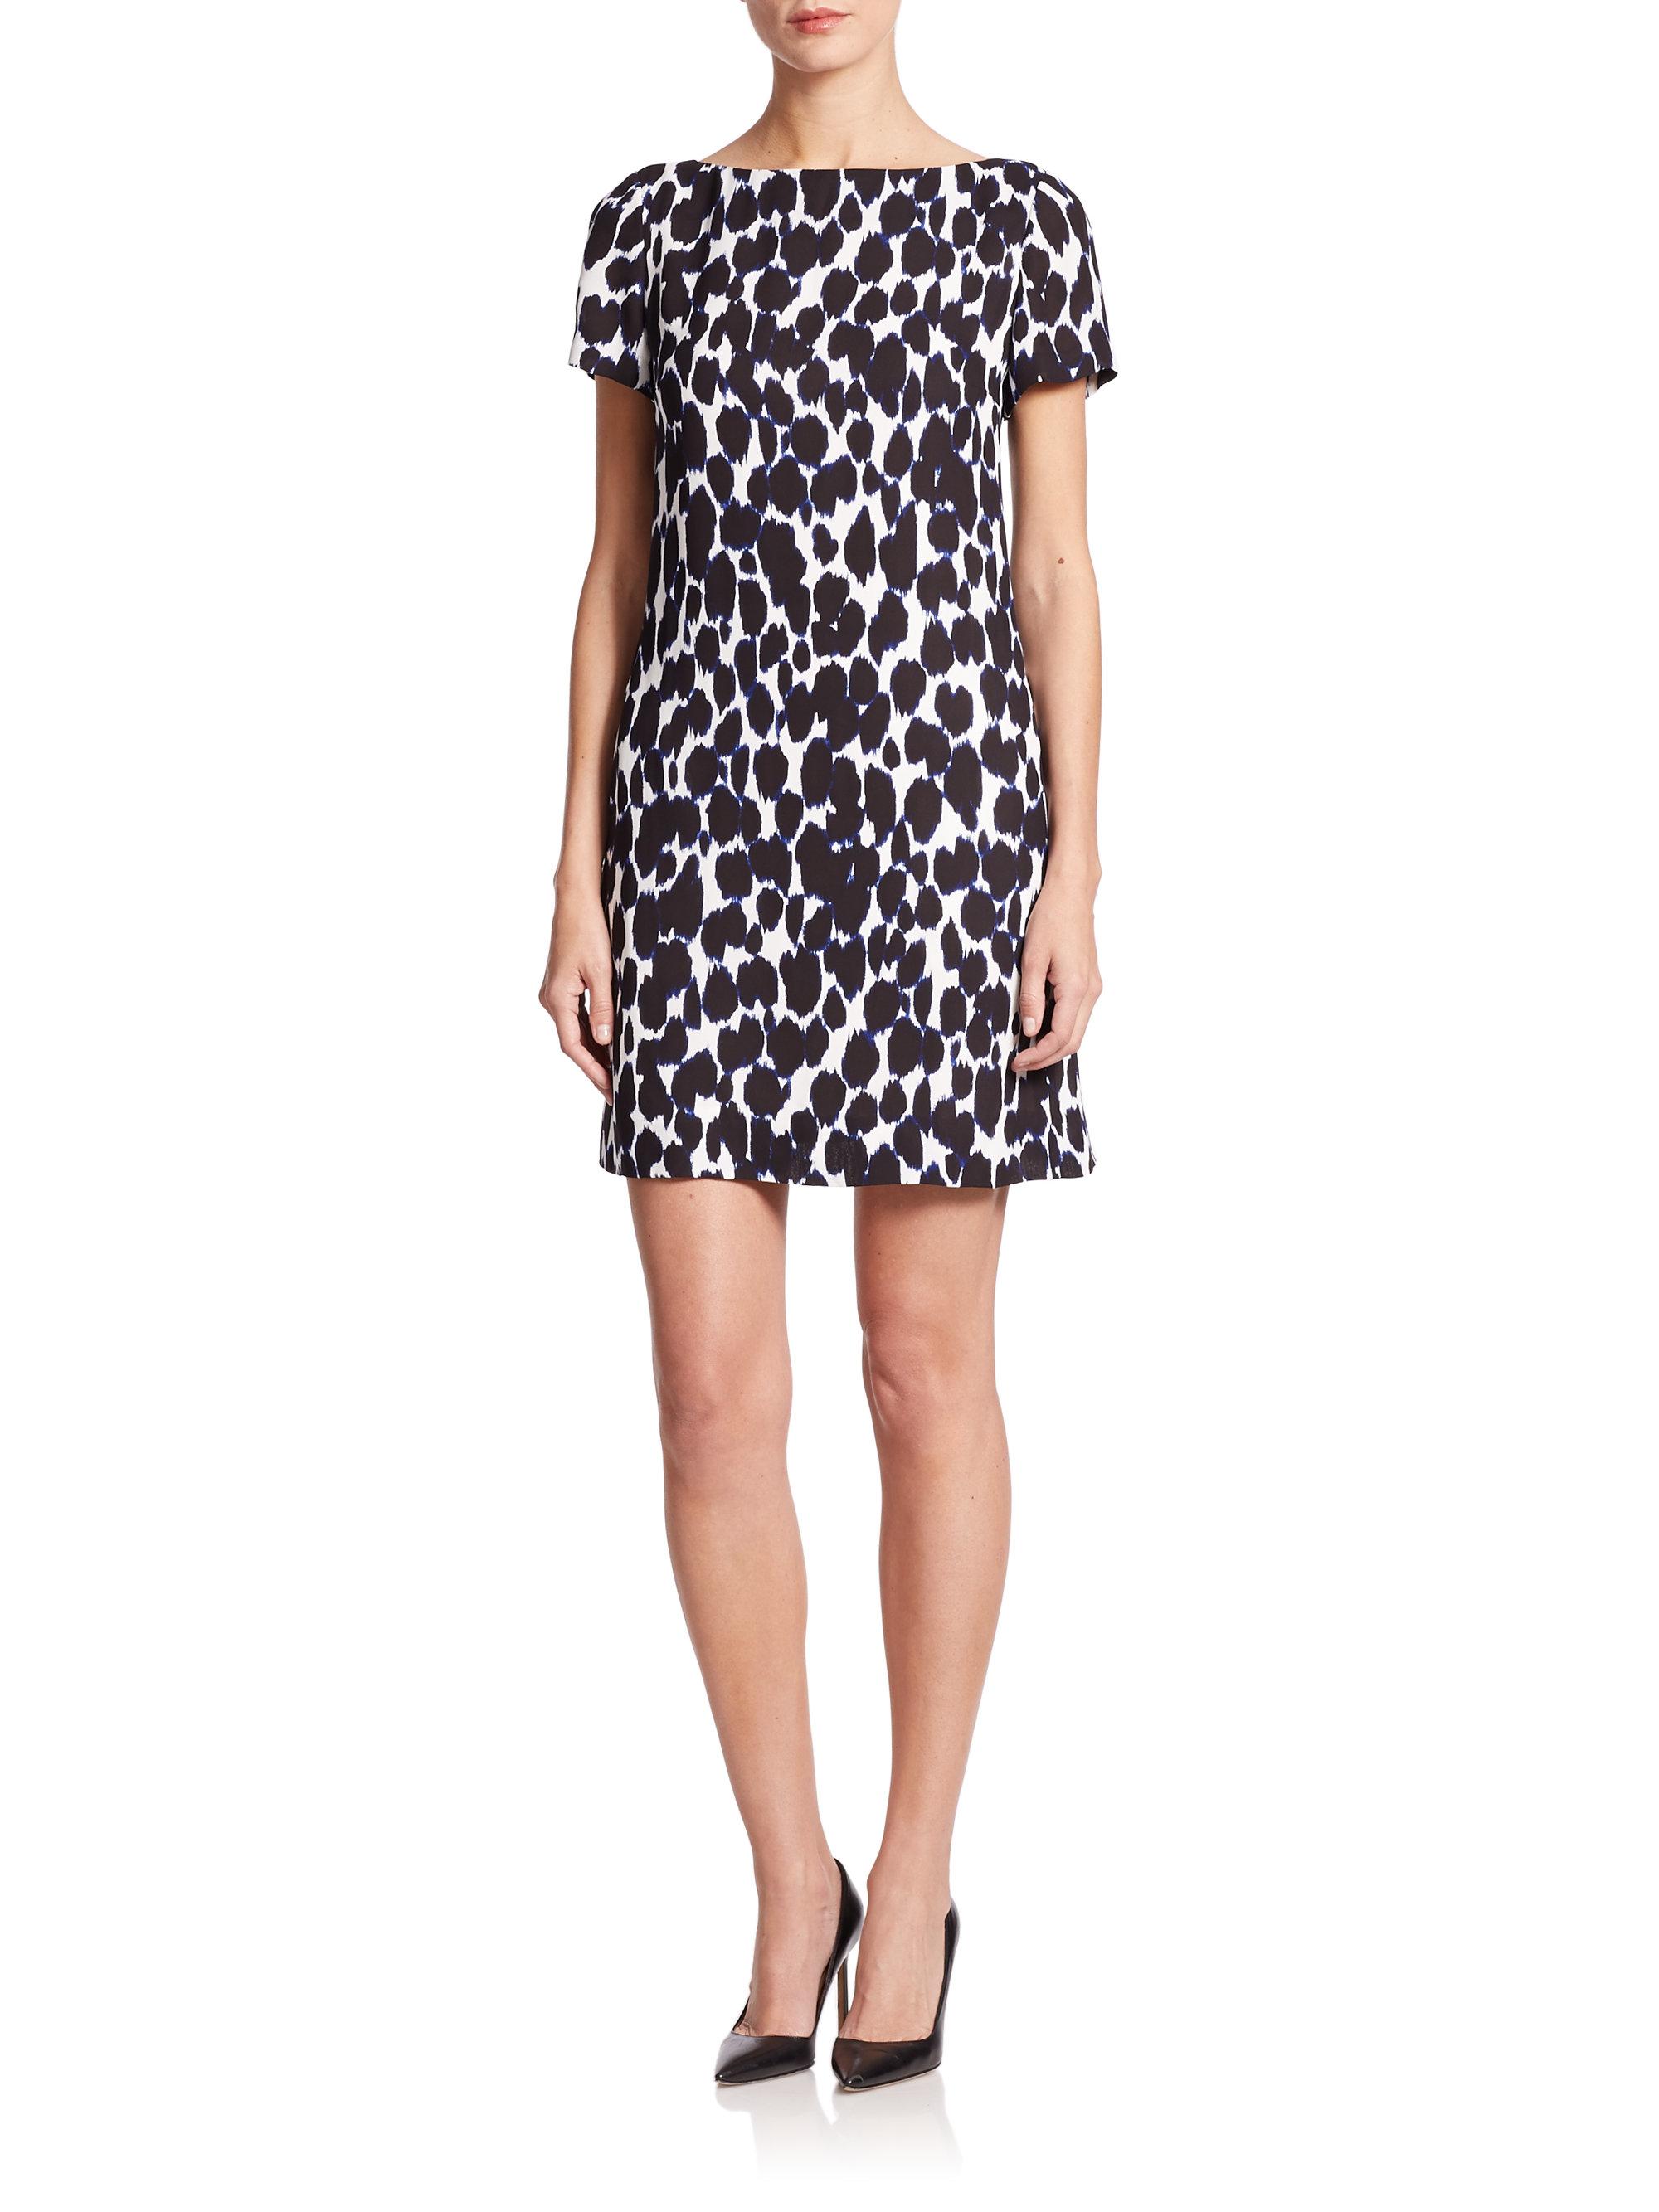 Kate Spade New York Leopard Print Swing Dress Lyst